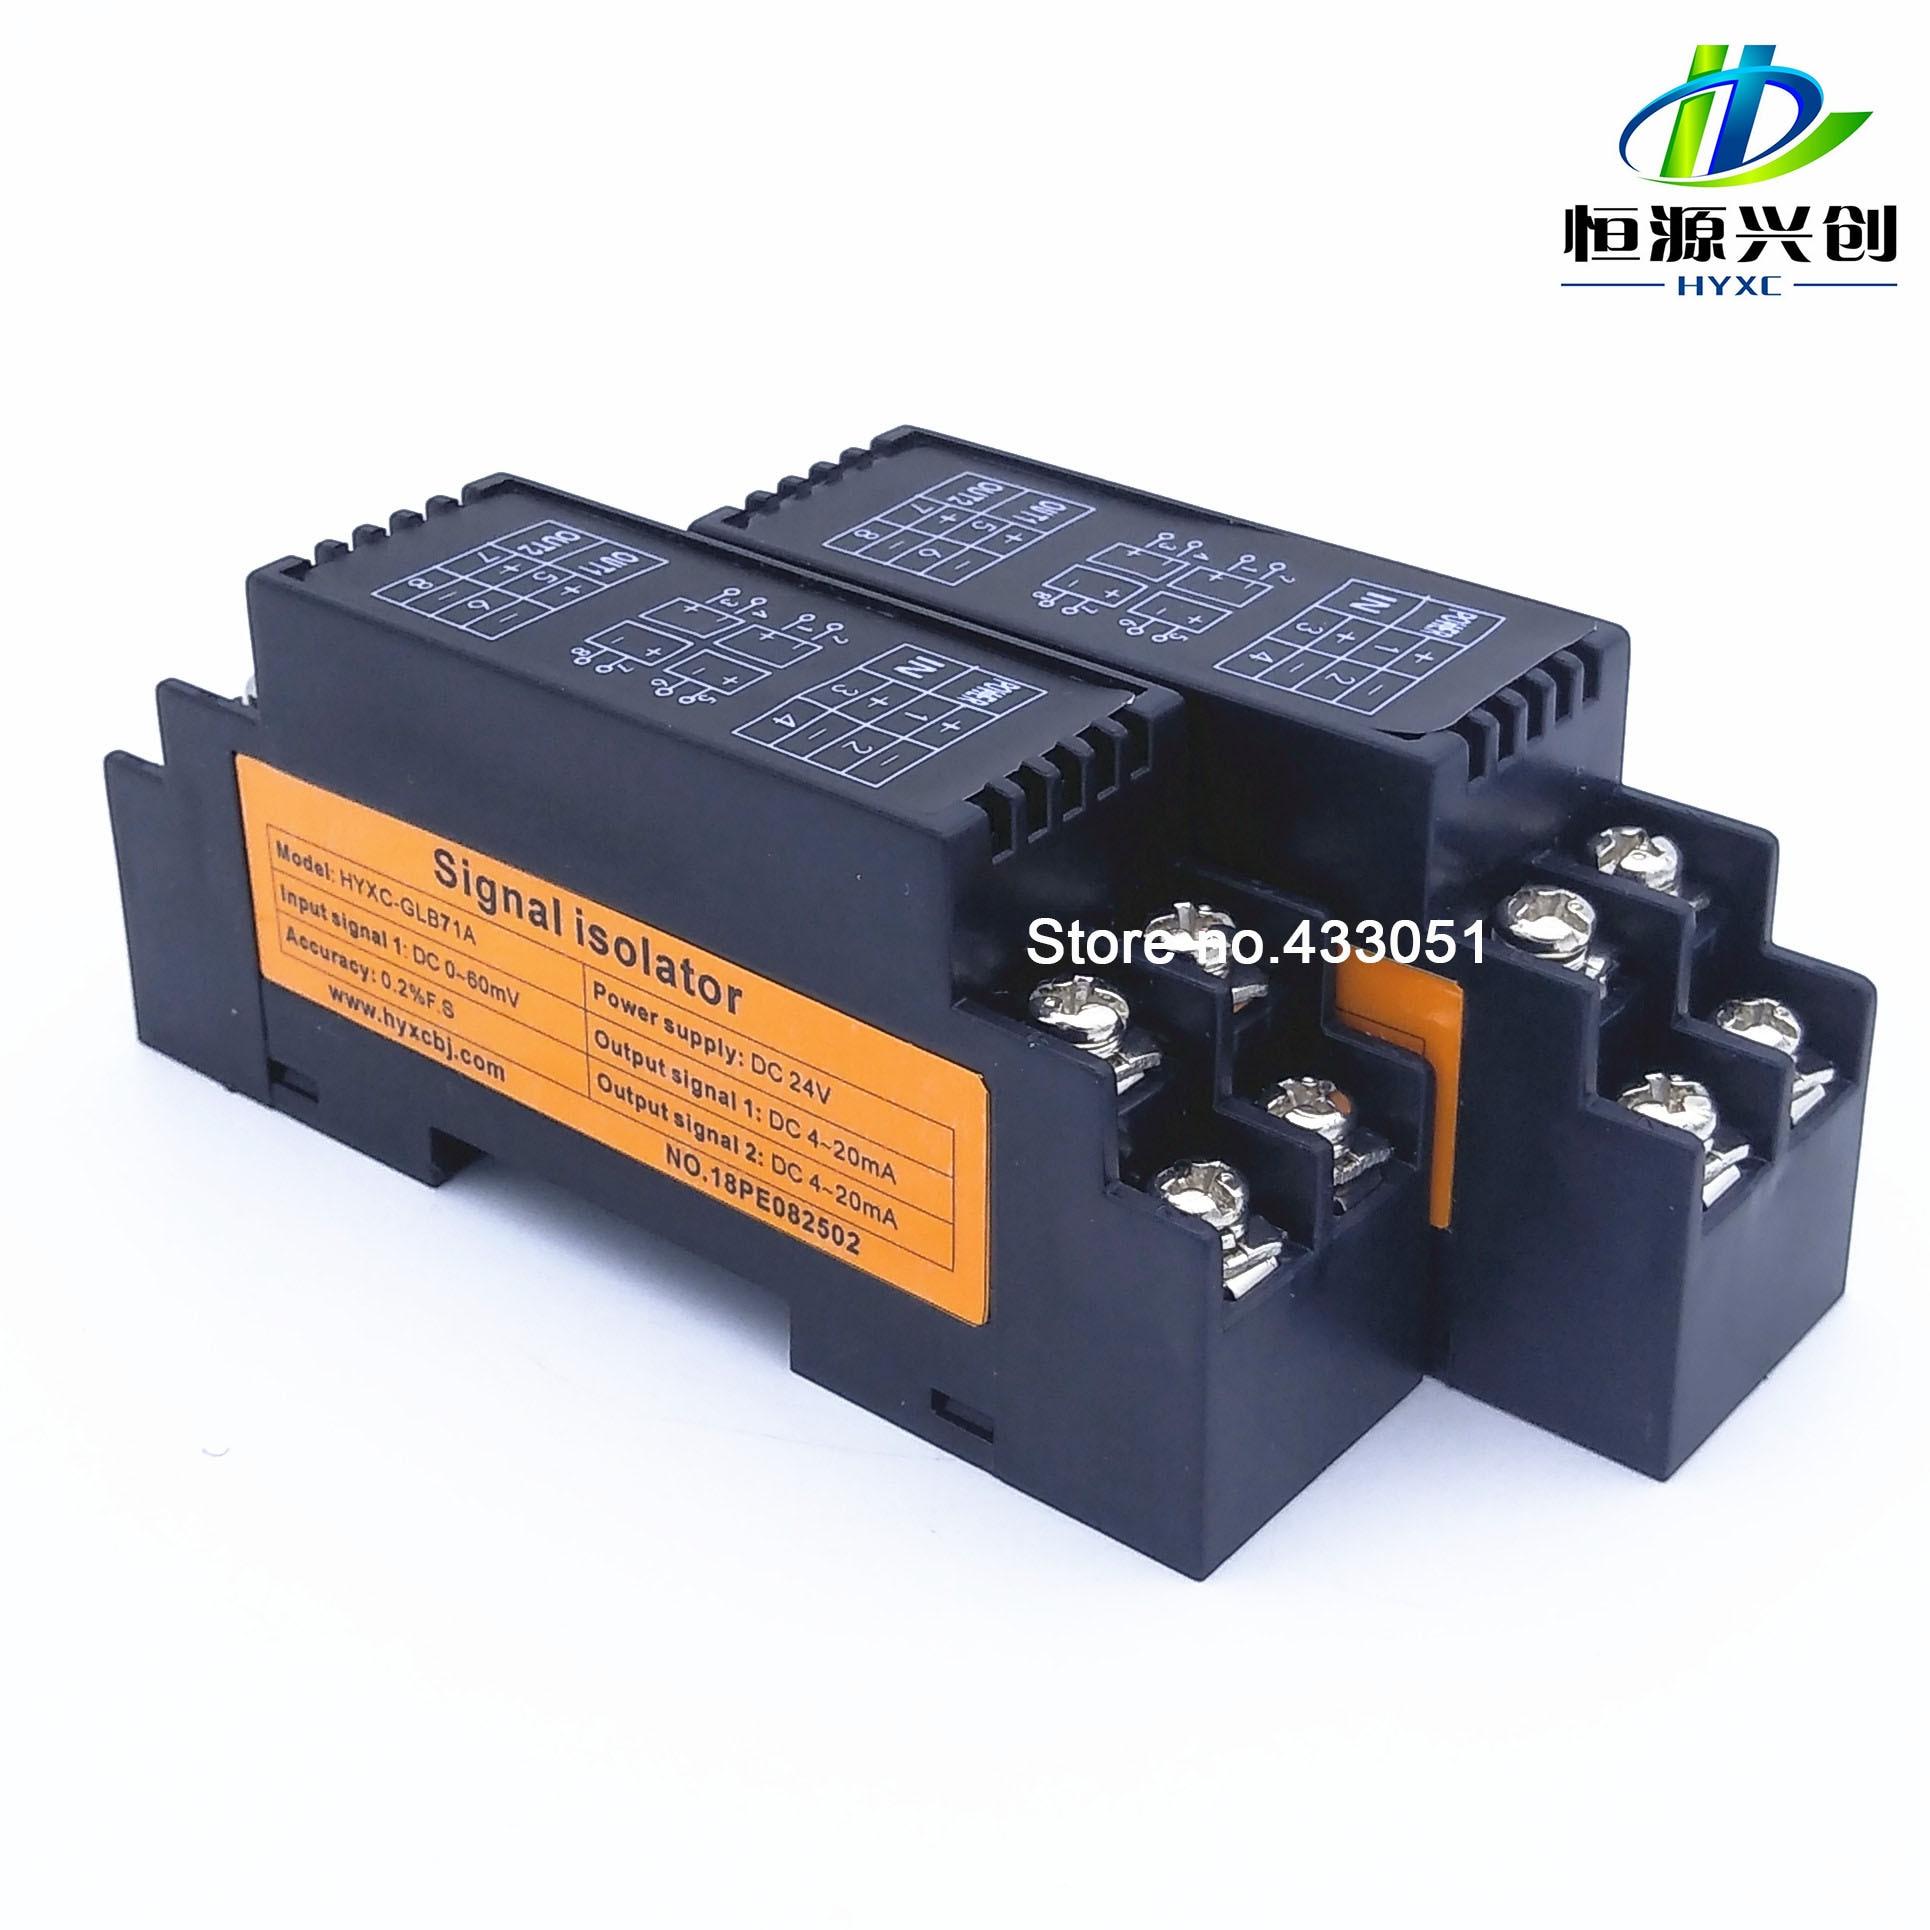 DC Signal Isolation Transmitter Input 0~75mV/4~20mA/0~10V Output 0~5V/-0~10V/20~4mA Multiple Signal Customization